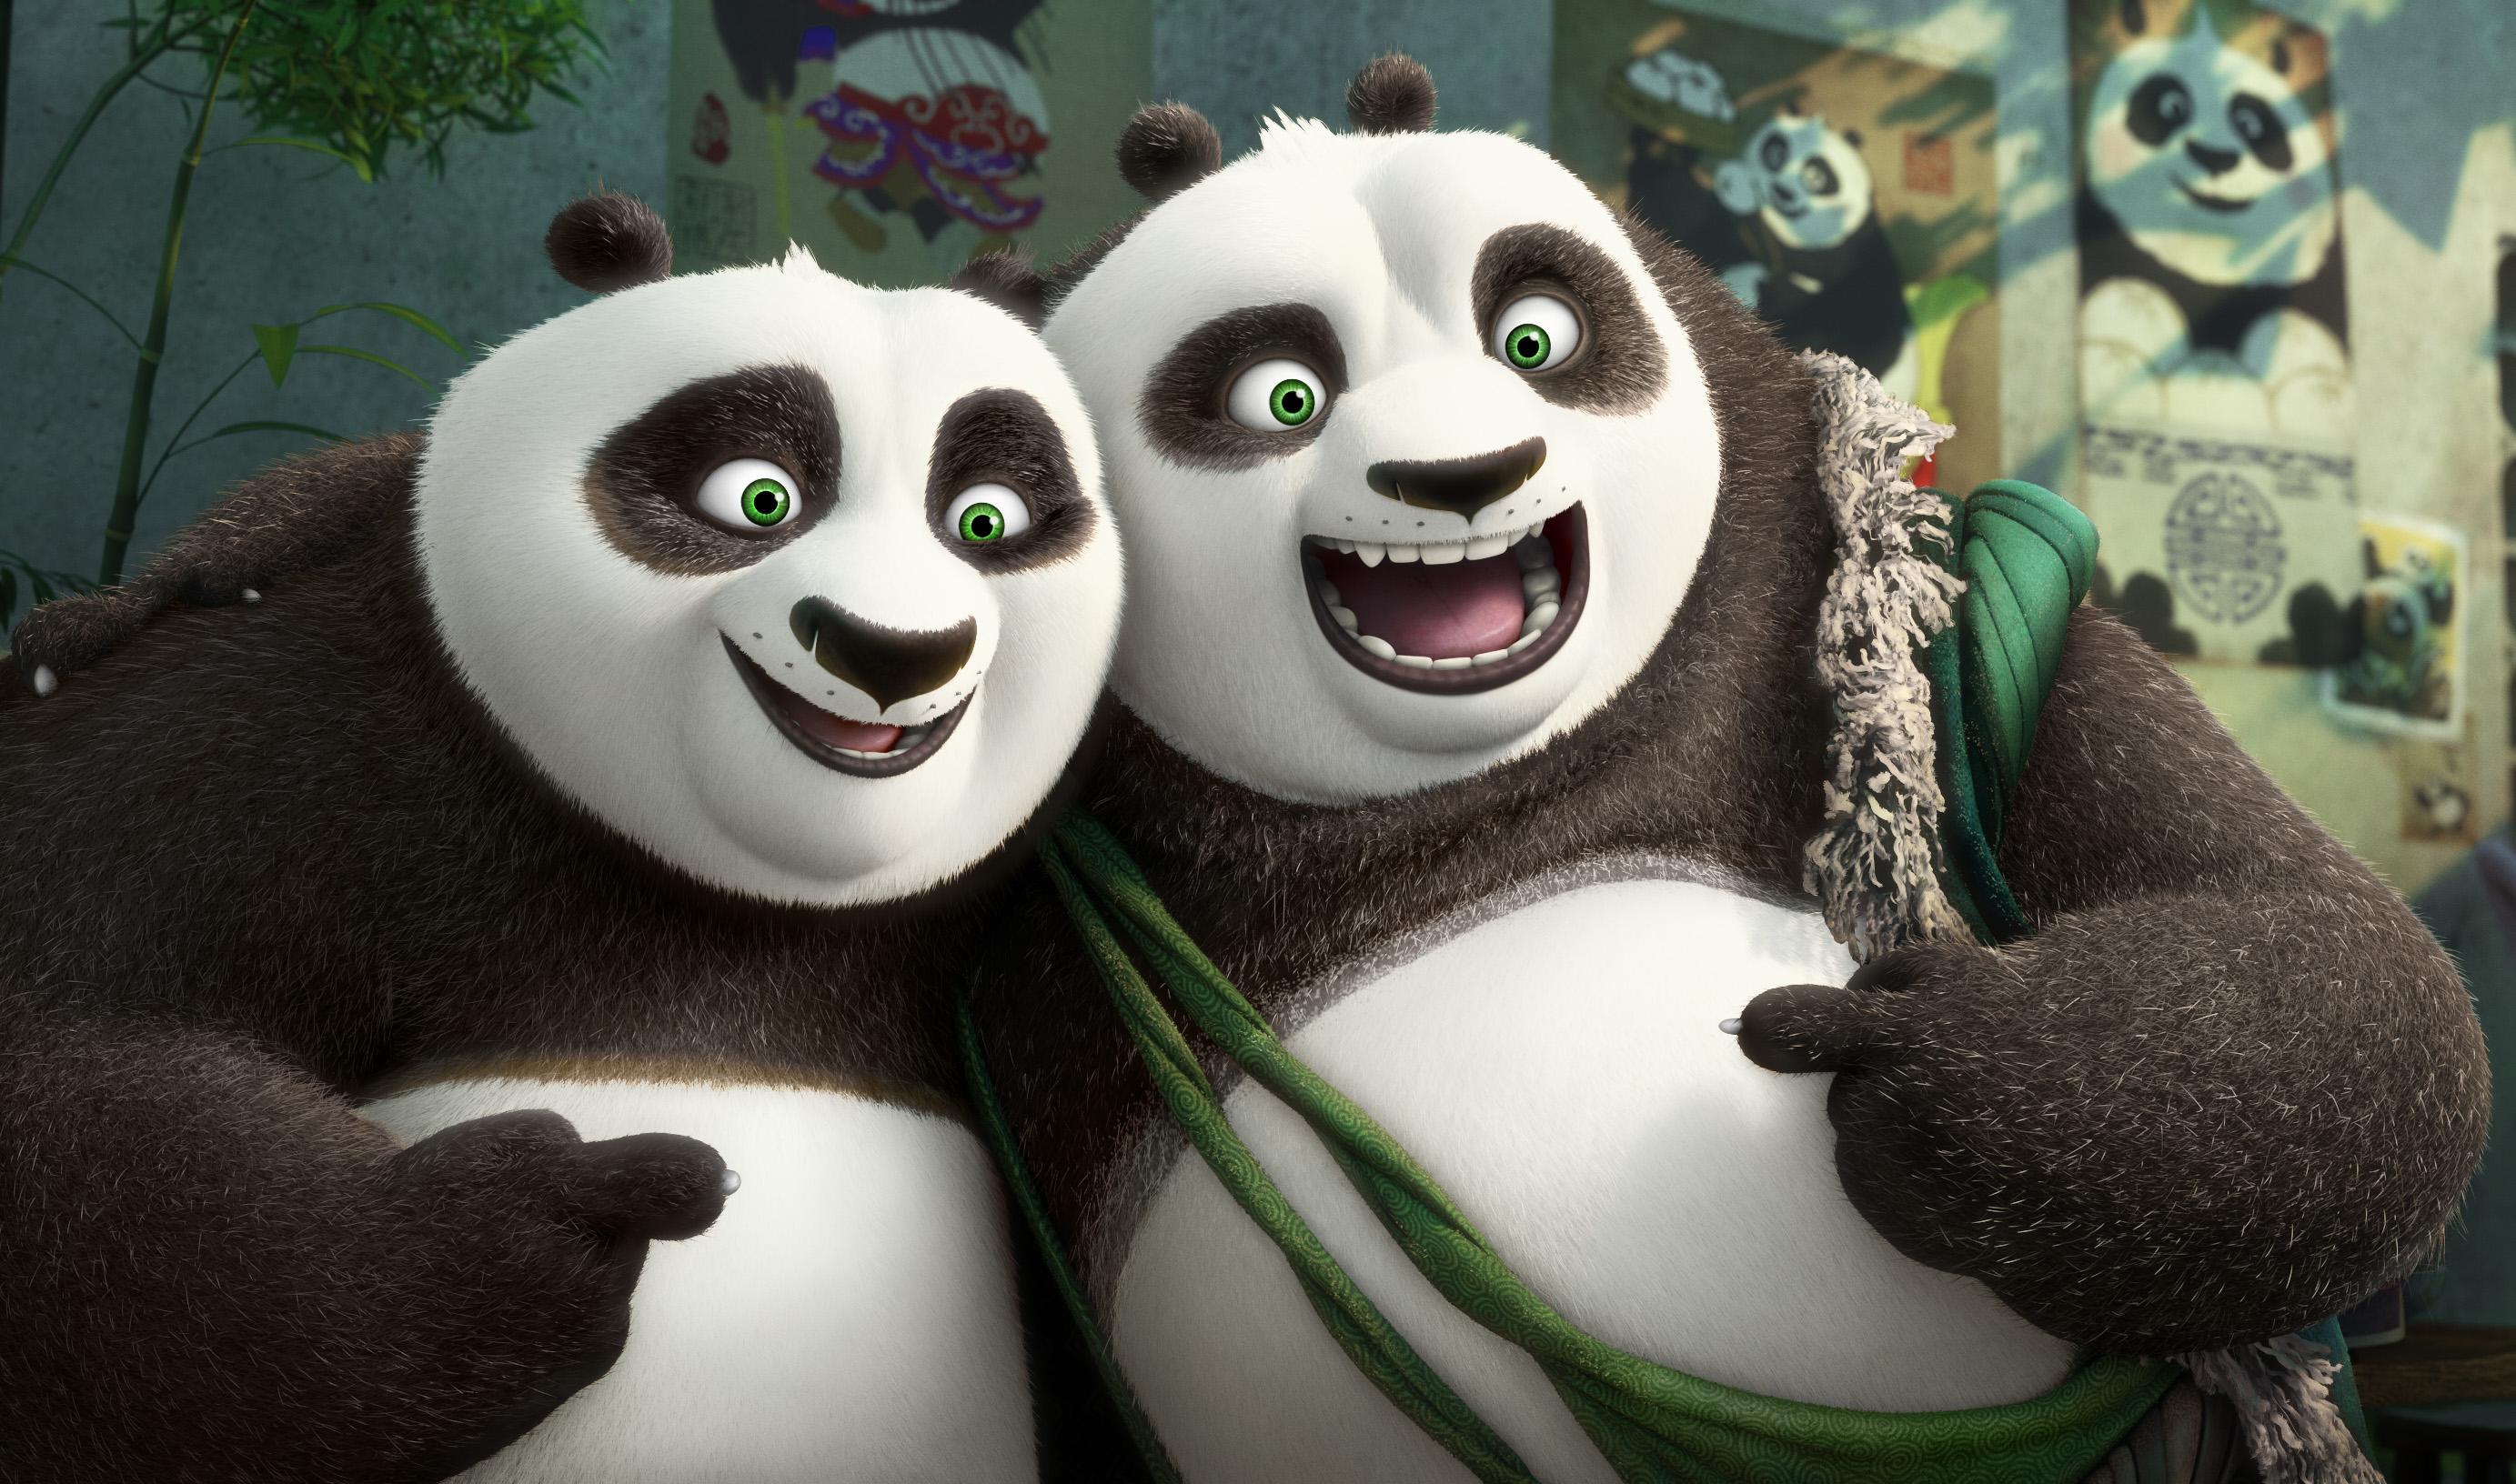 kung-fu-panda-3_K4evBs